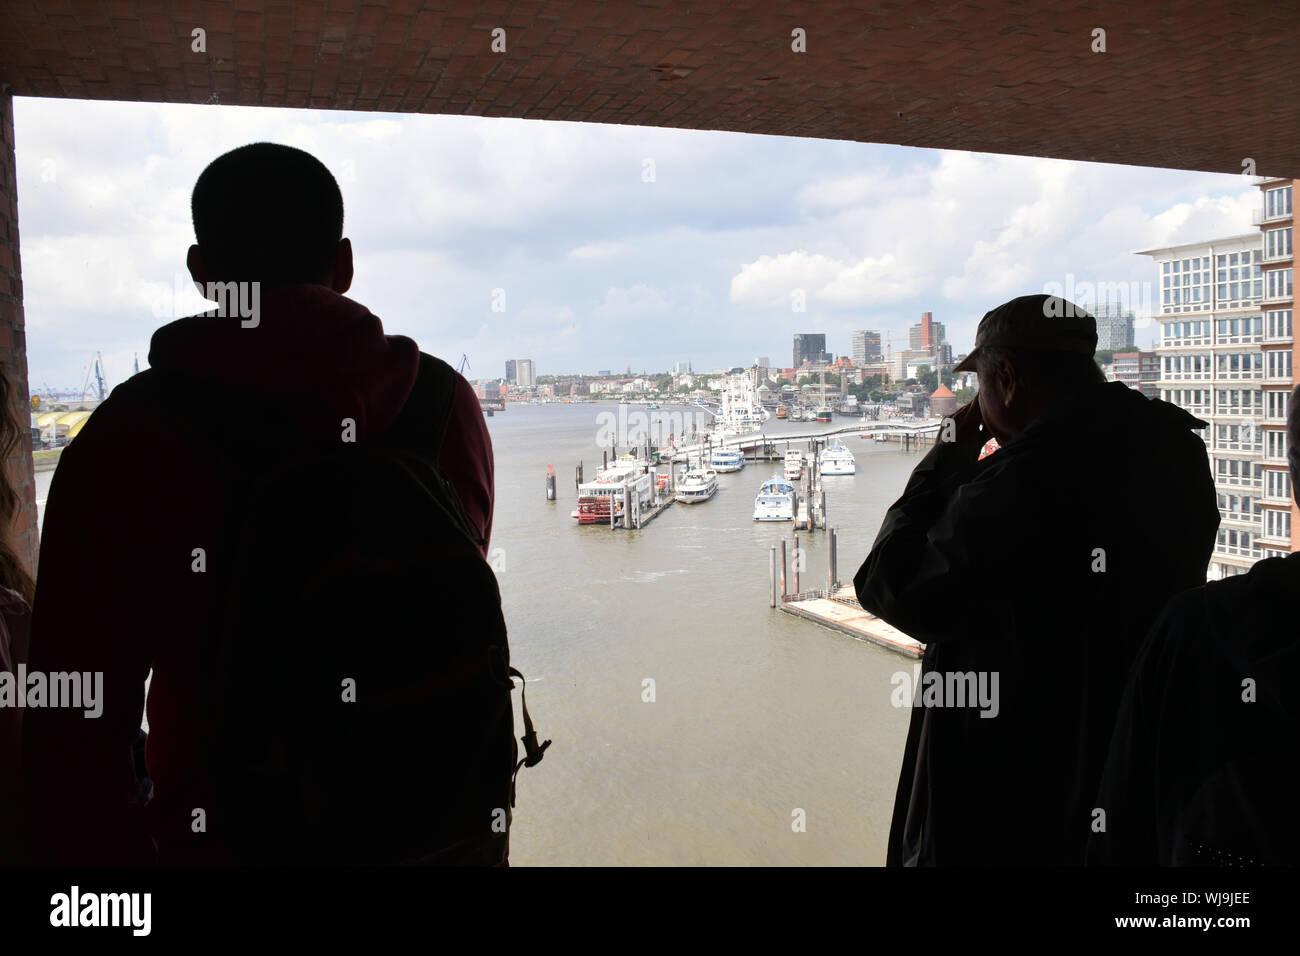 Viewing platform on the new Elbphilharmonie Hamburg (opera house), Germany Aug 2019 - Stock Photo